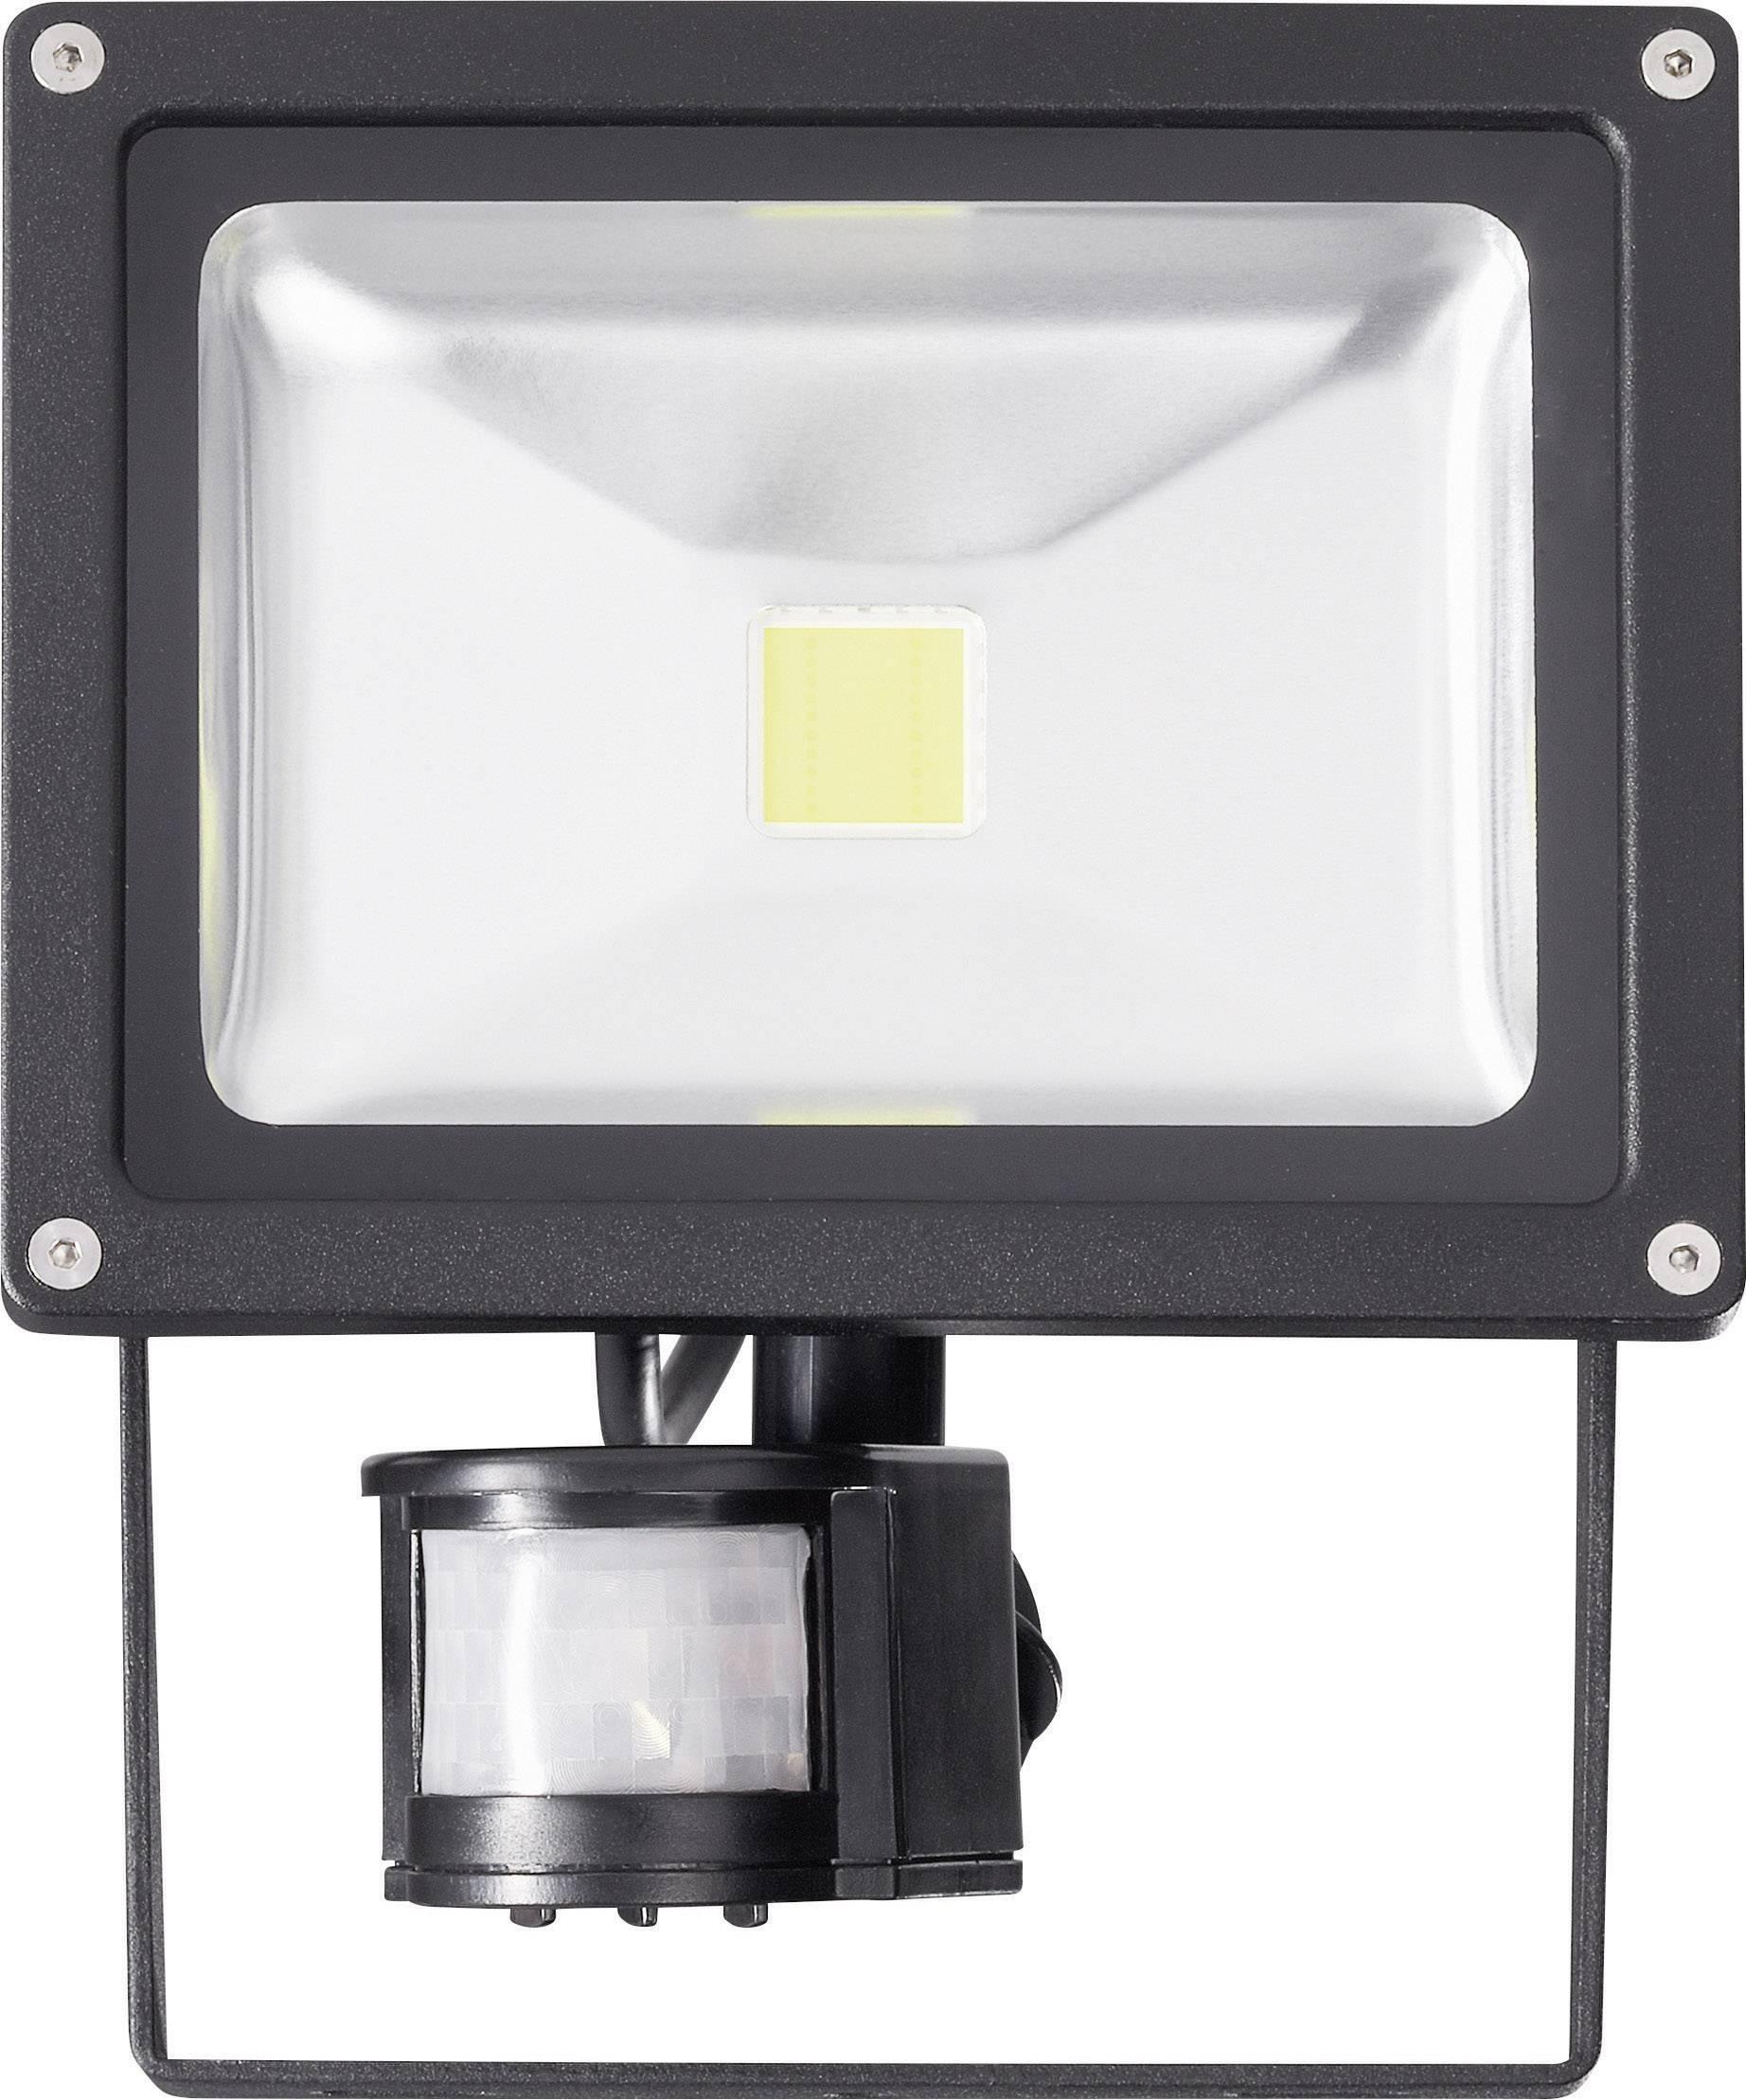 Fabulous LED-schijnwerper met bewegingsmelder 627900 LED | Conrad.nl ZS16